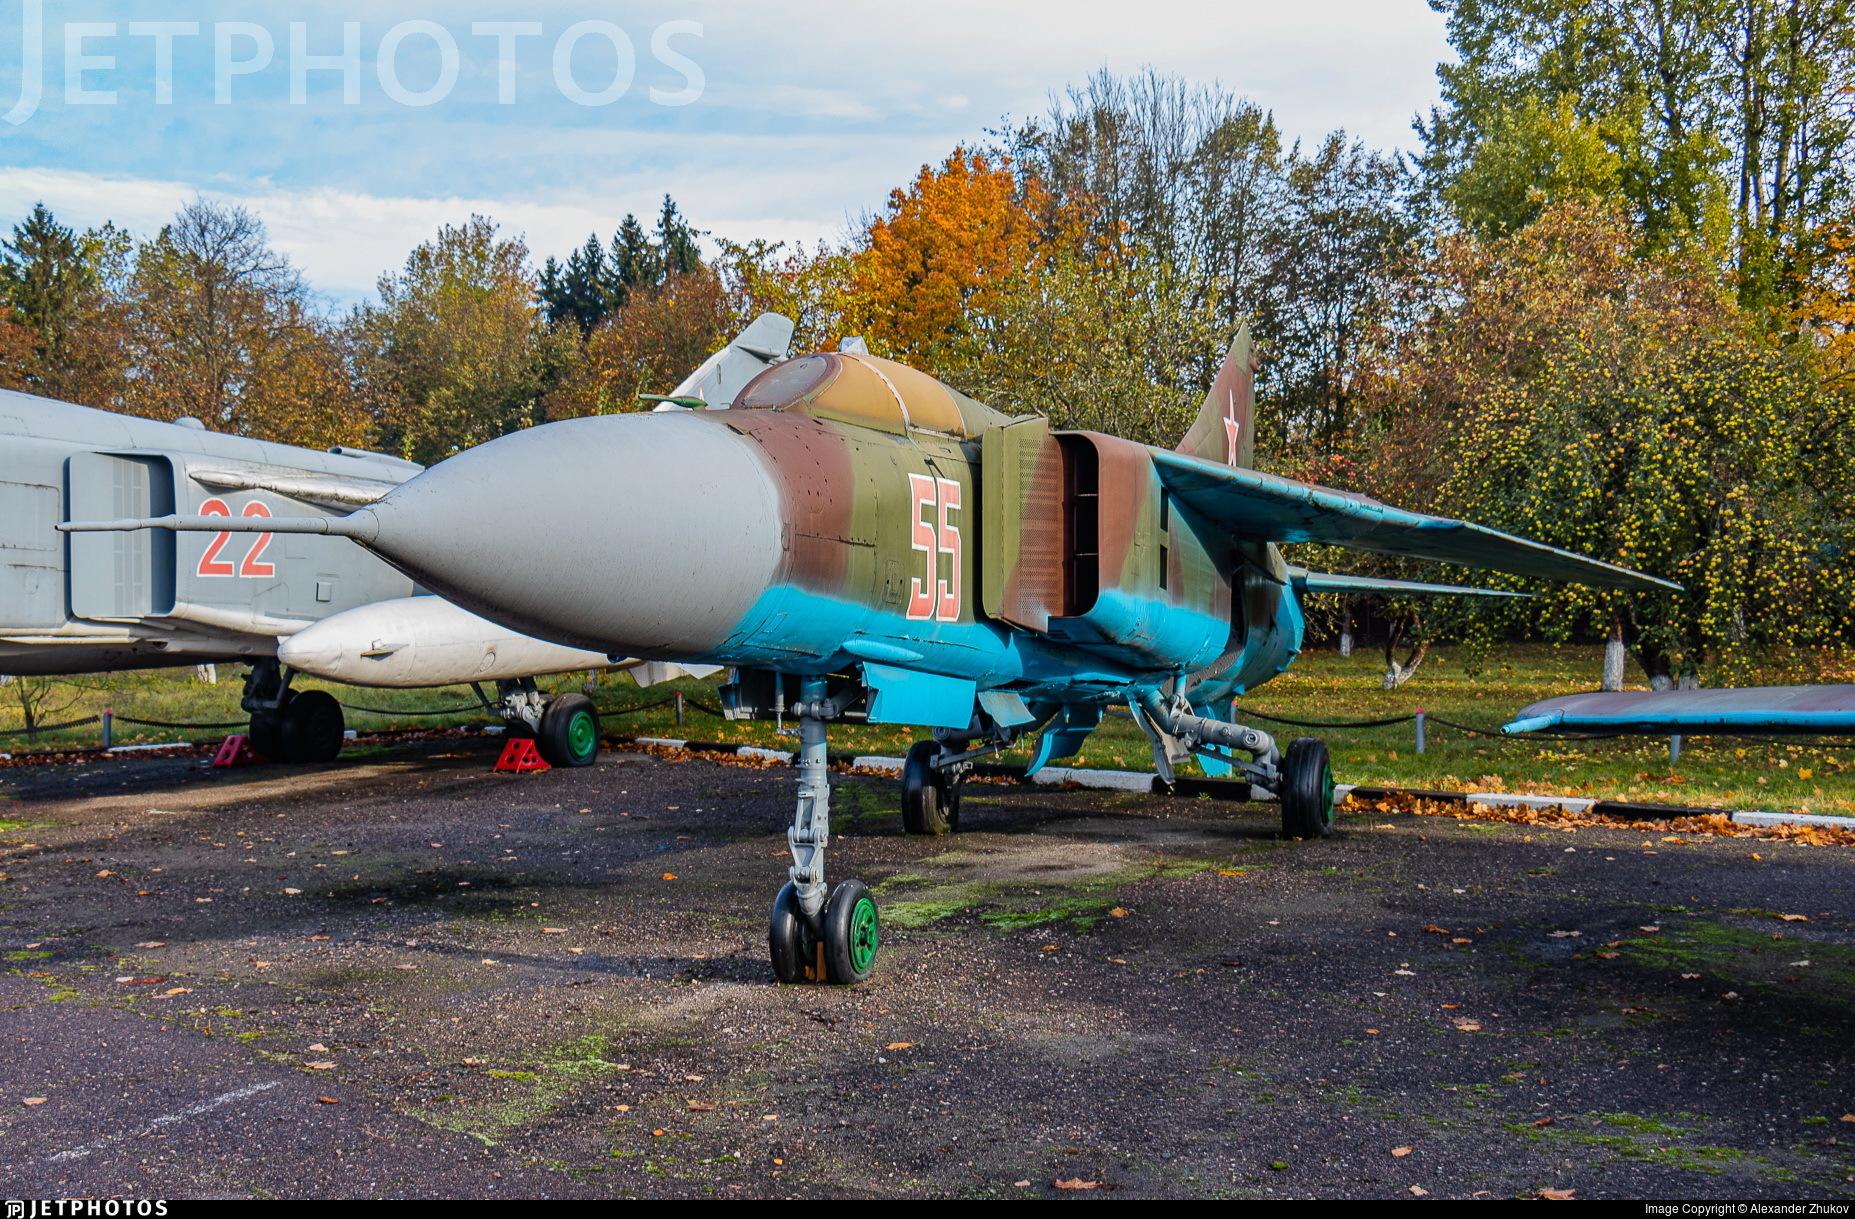 55 - Mikoyan-Gurevich MiG-23ML Flogger G - Soviet Union - Air Force